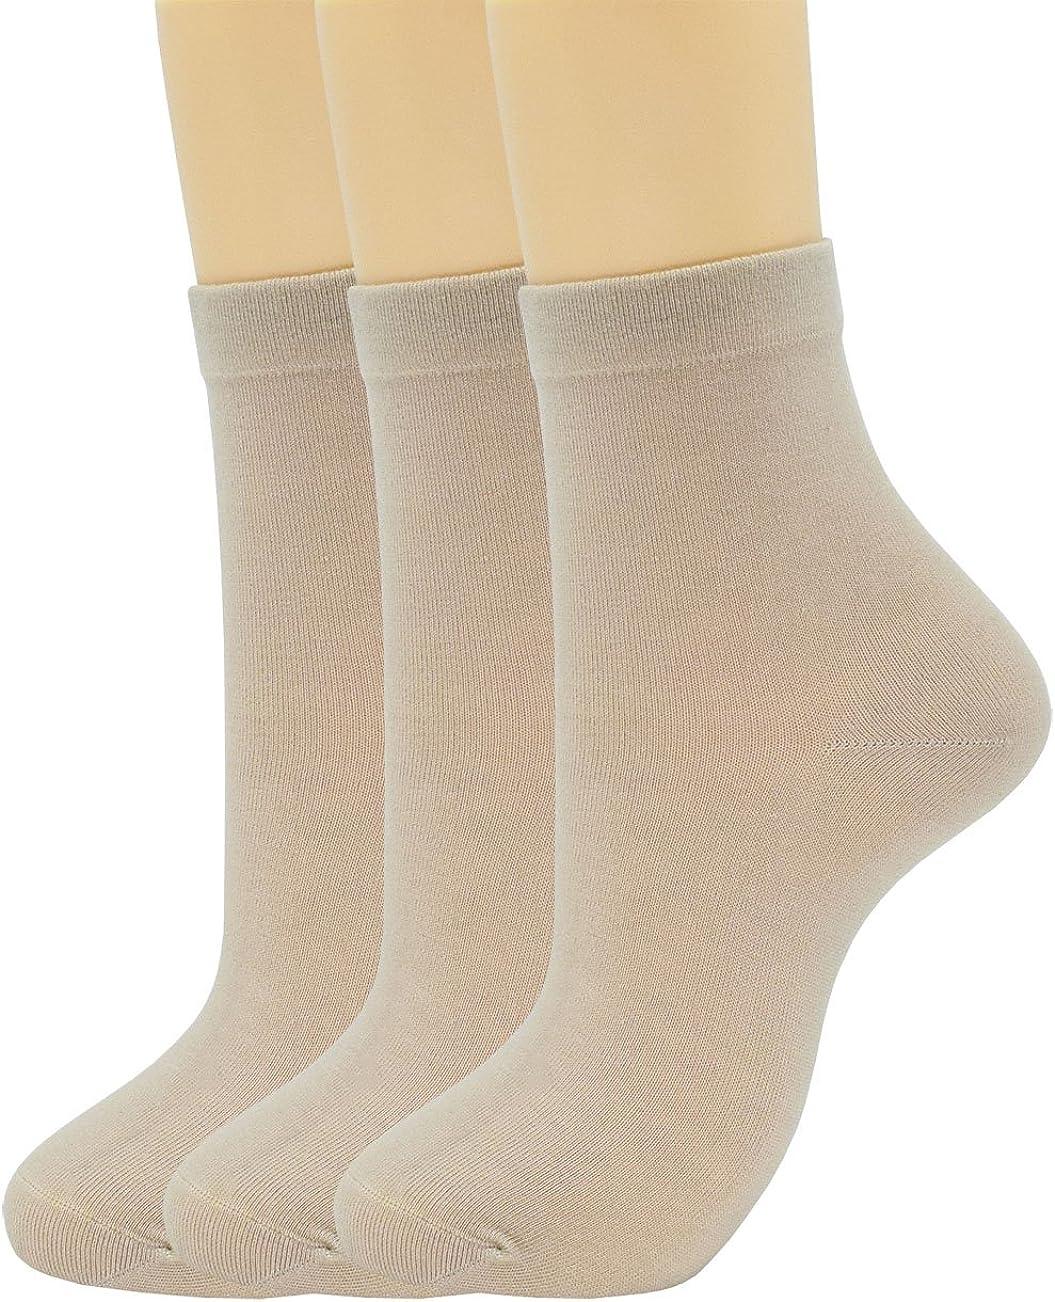 SRYL Women Fashion Casual Cotton Socks W1005